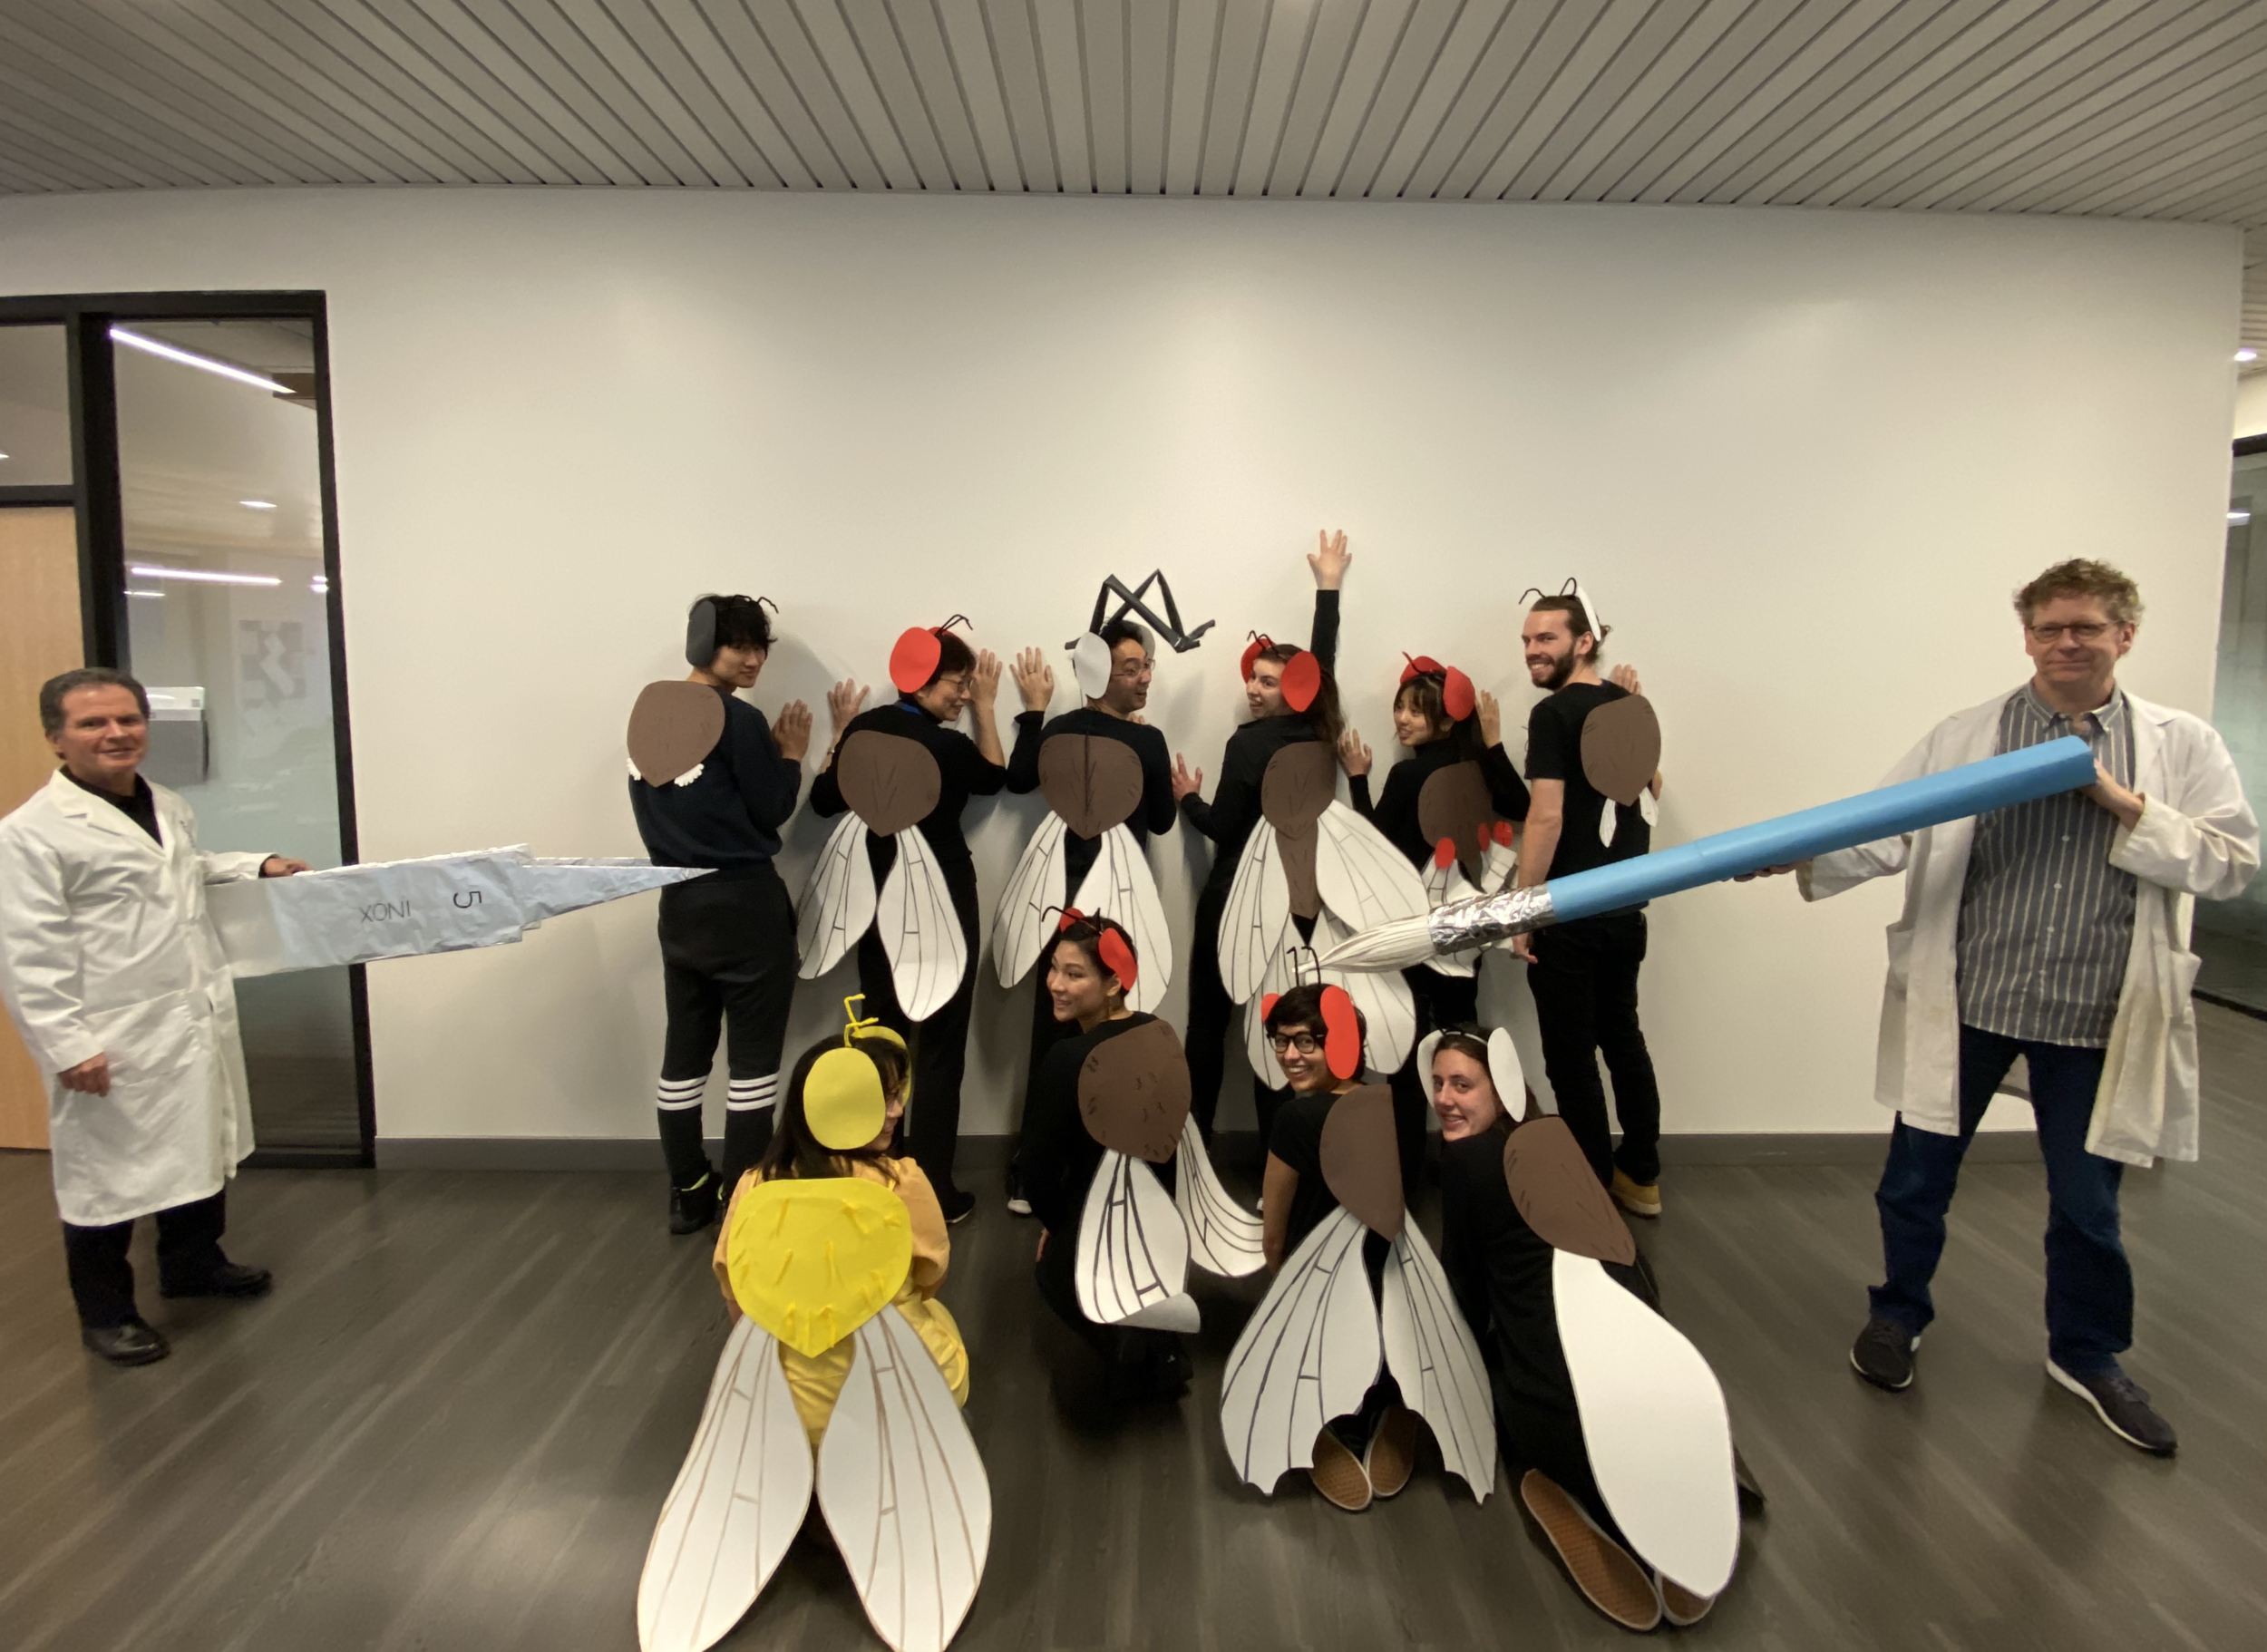 Hallowe'en 2019 –15th Floor MaRS – Lipshitz and Smibert Labs